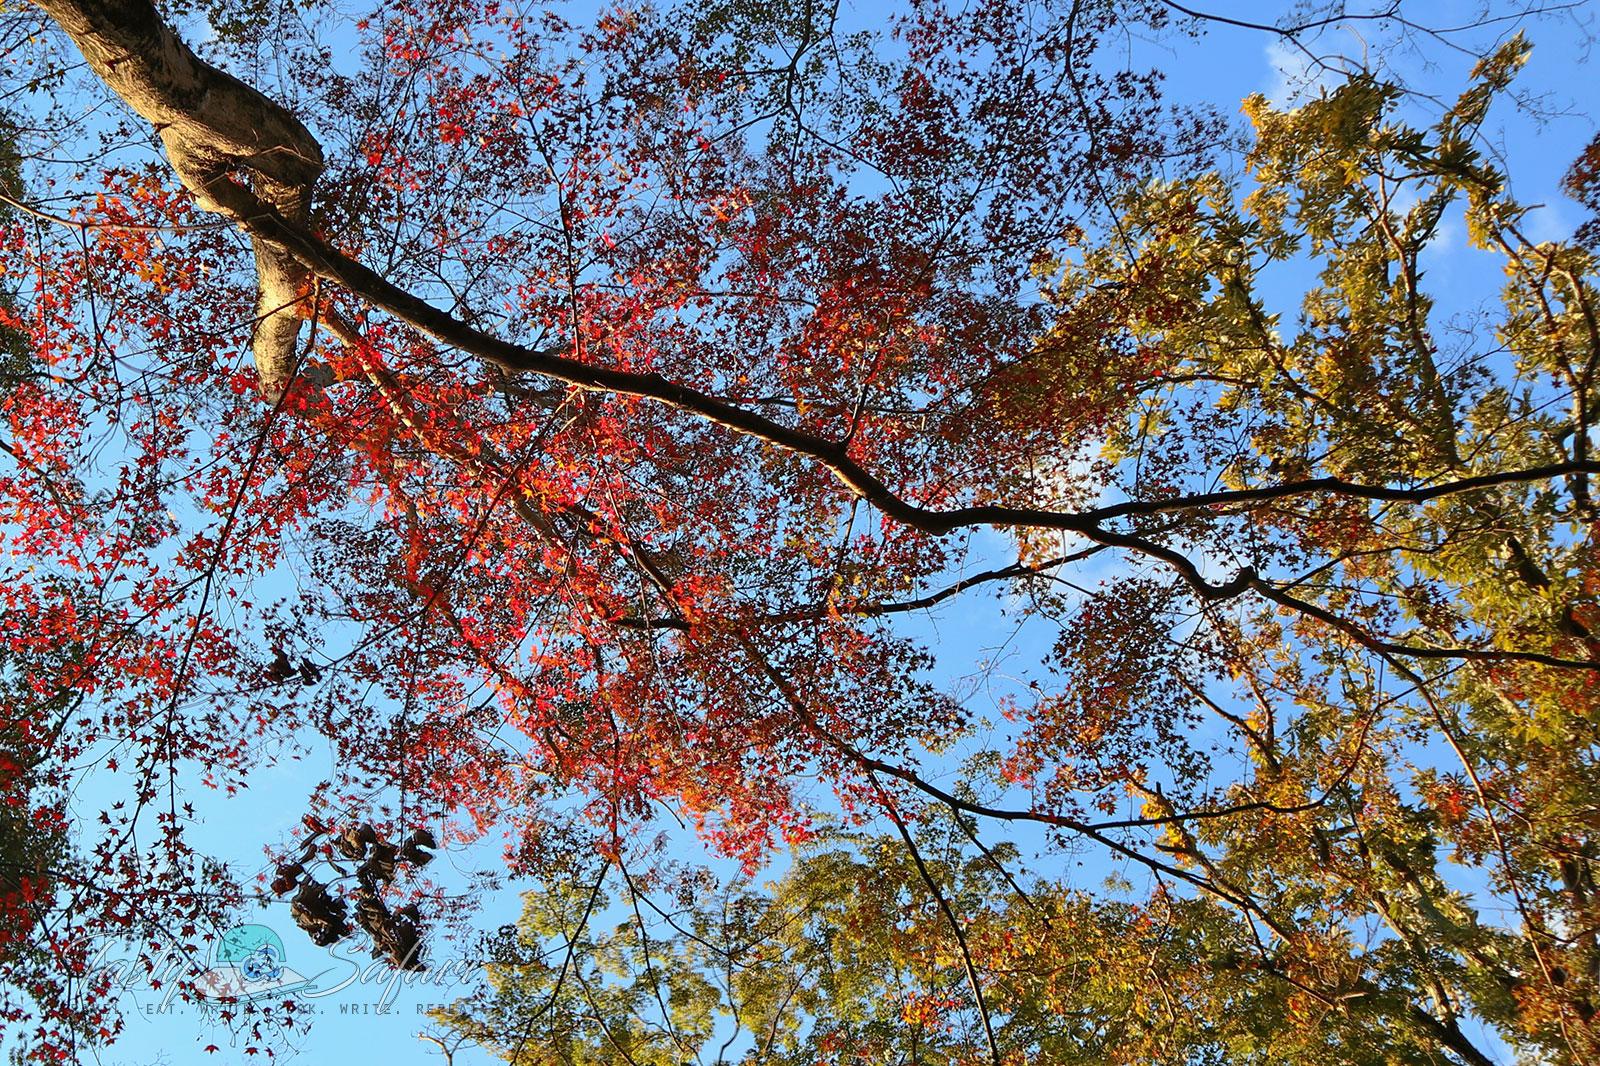 Autumn leaves at Fushimi Inari, November 4, 2019